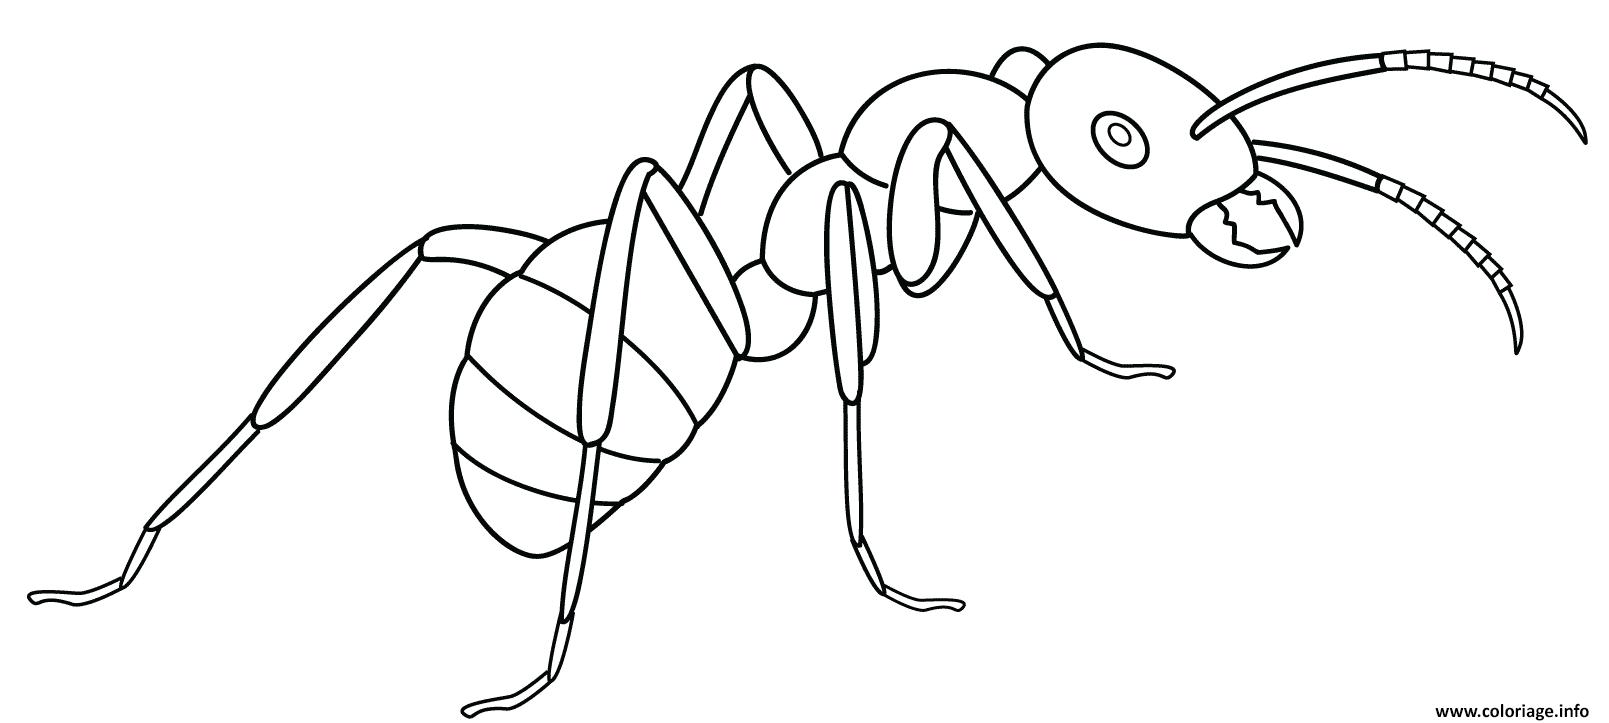 Dessin fourmi odorante dessinpar Artsashina Coloriage Gratuit à Imprimer